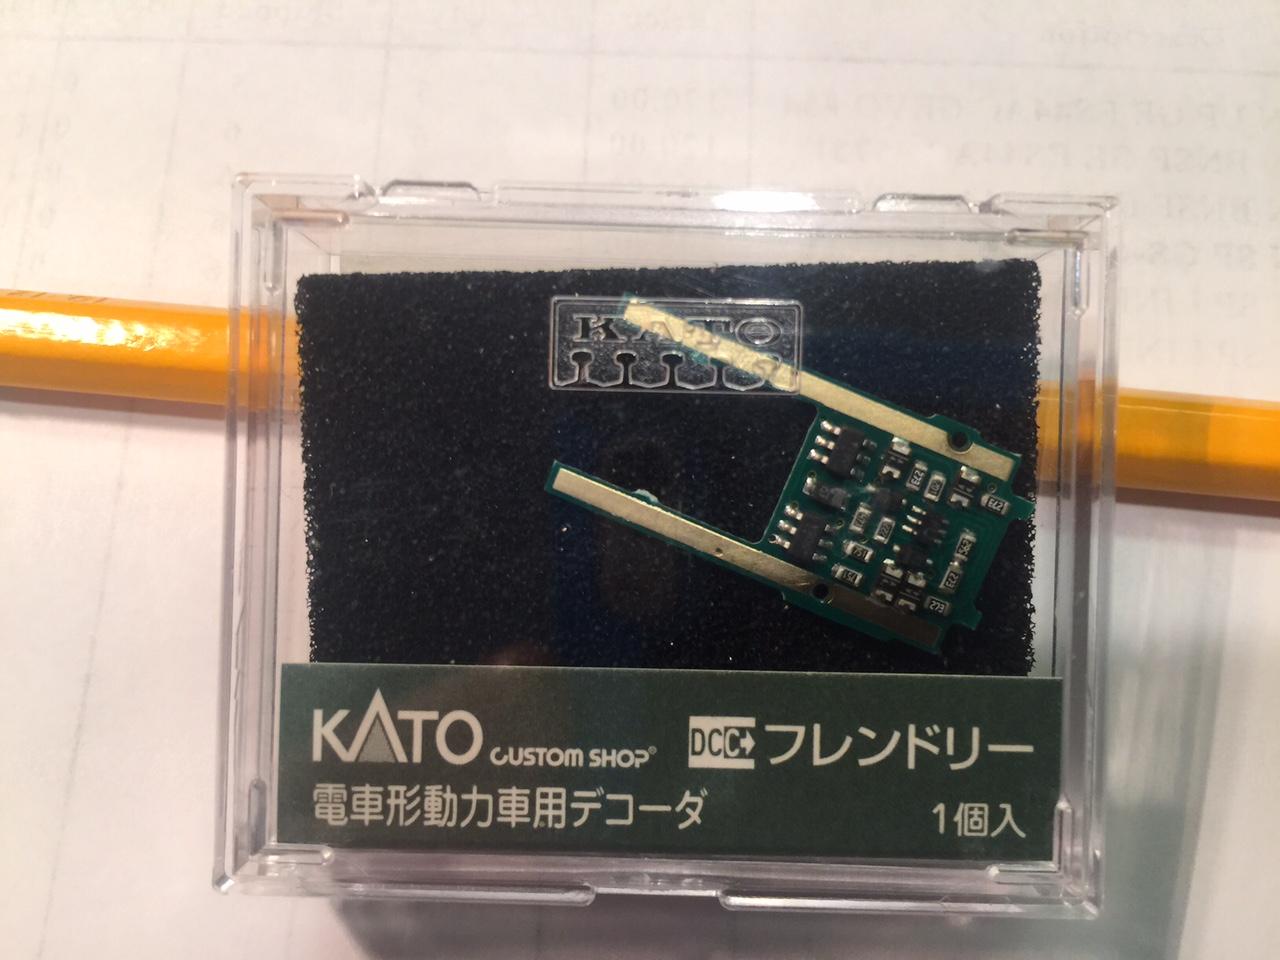 Kato 29-351 EM13 DCC DECODER